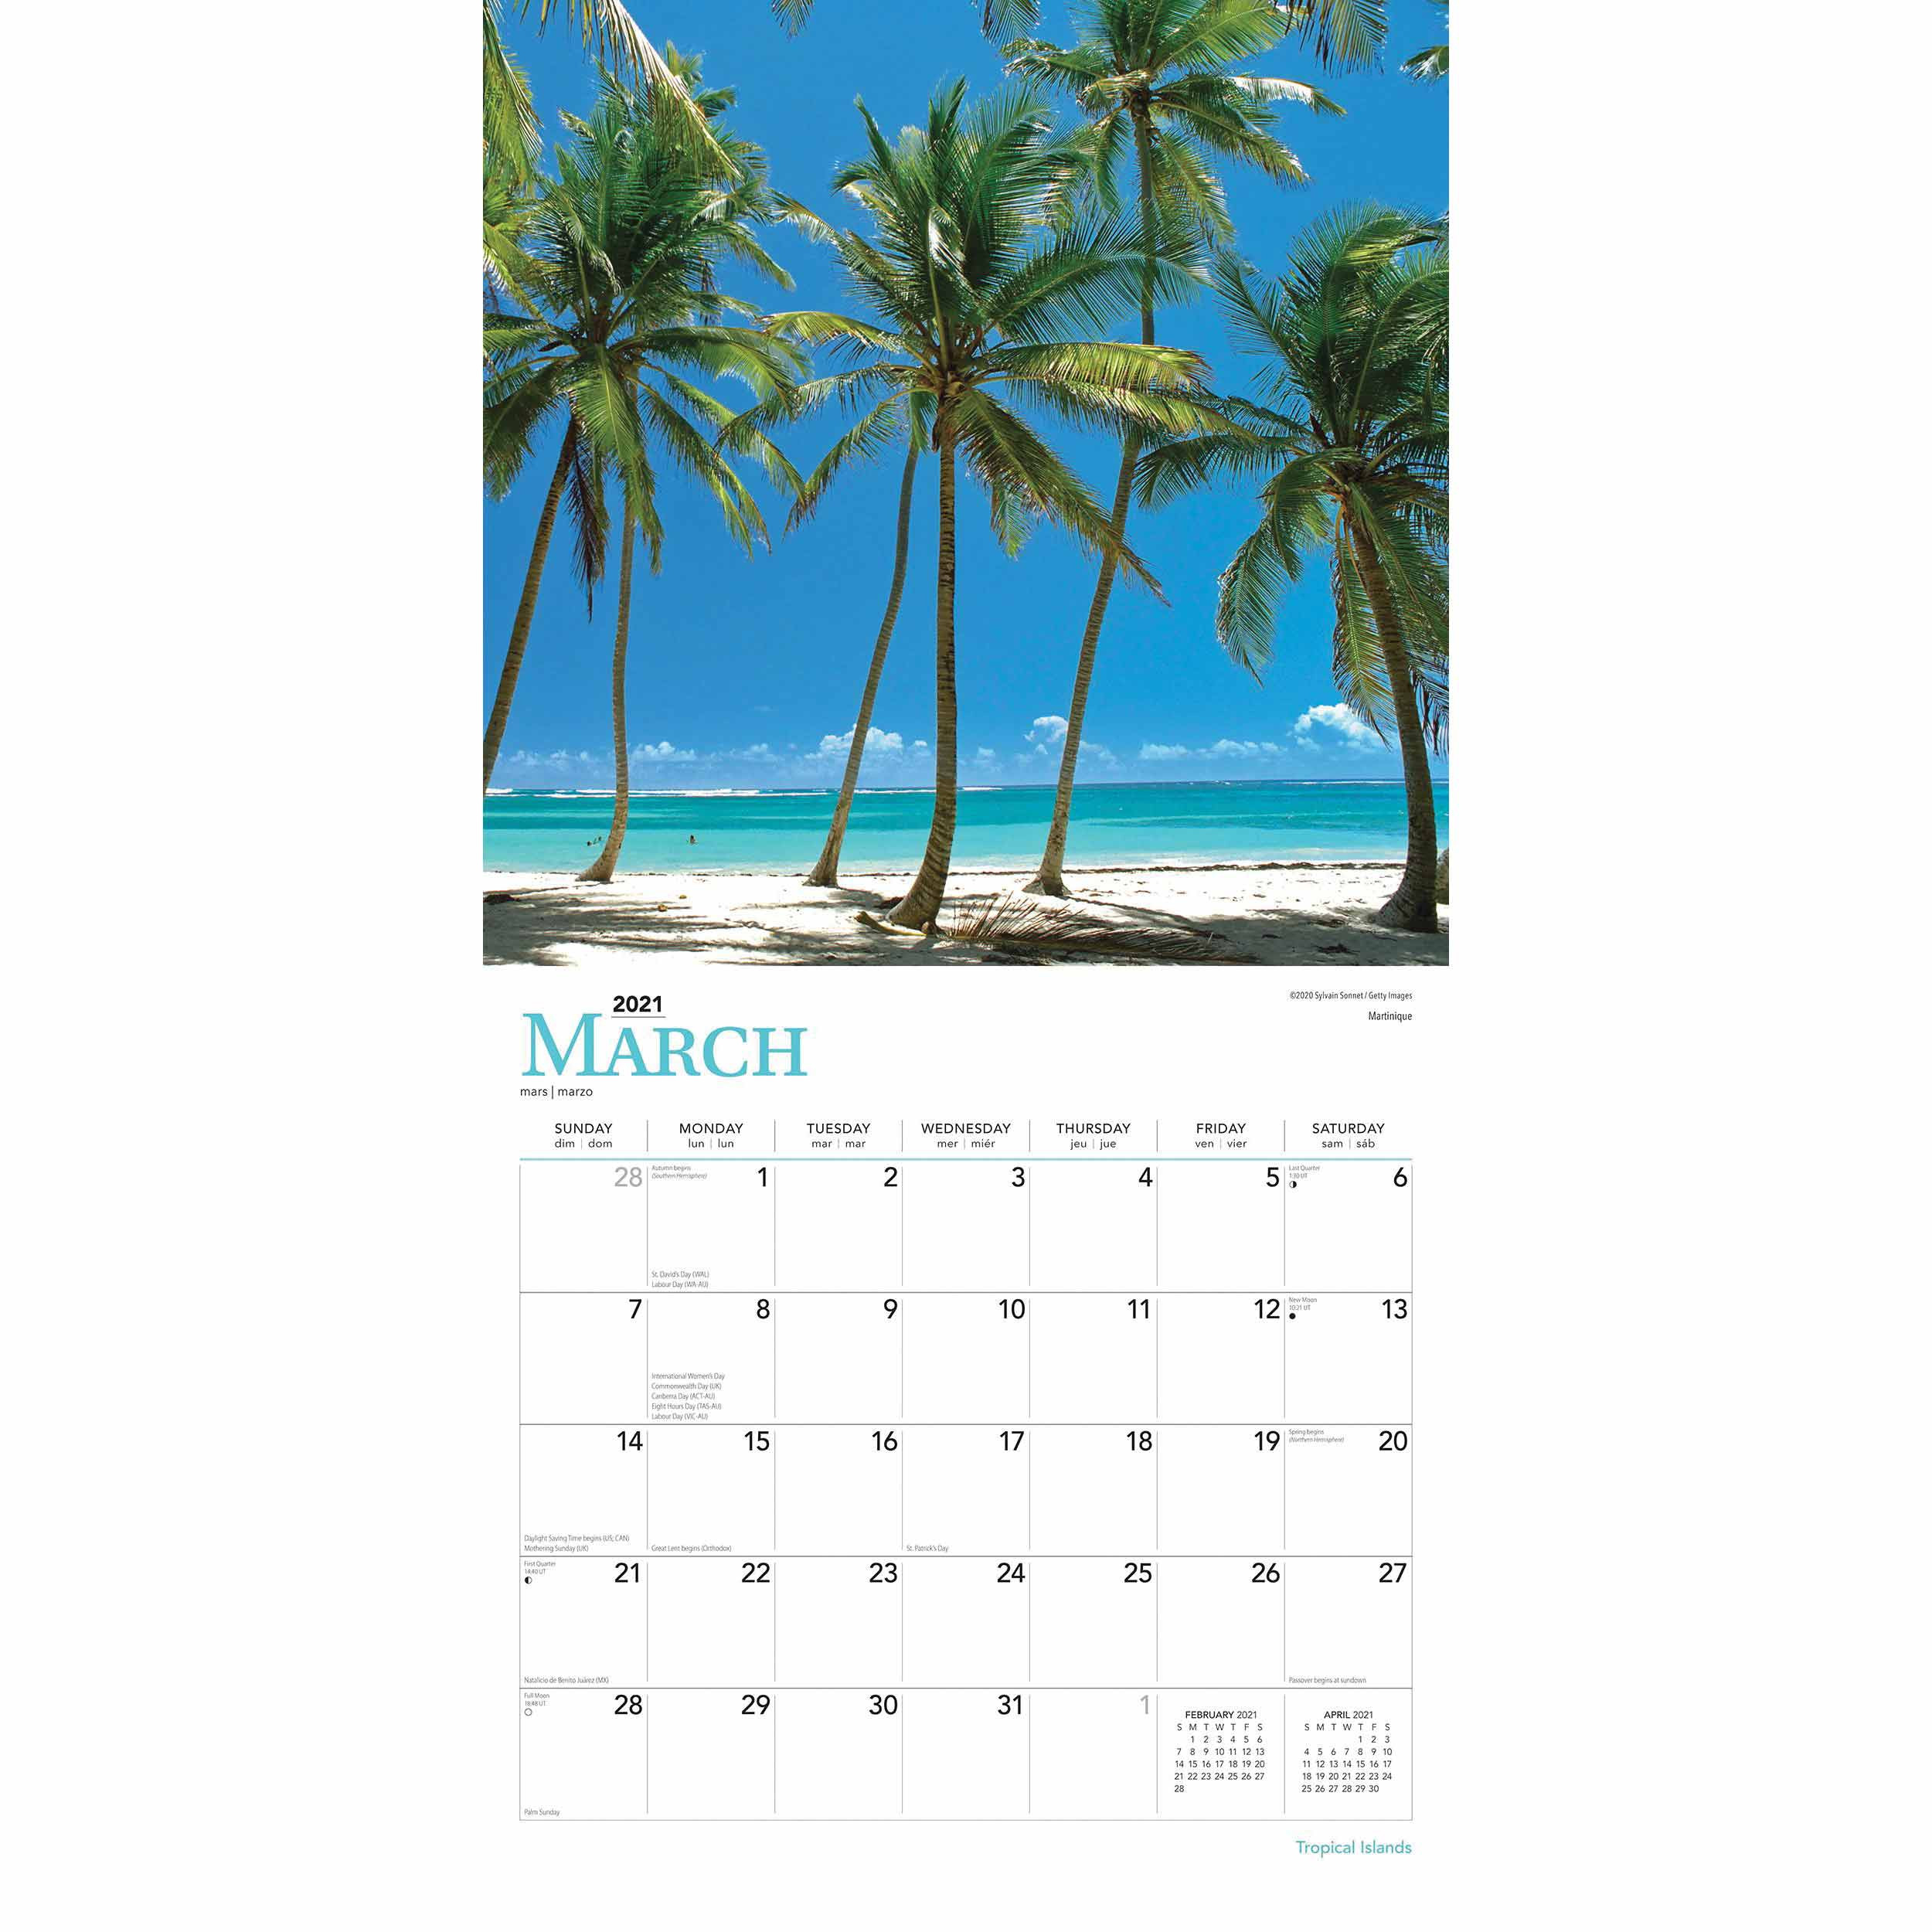 Tropical Islands Calendar 2021 At Calendar Club-2021 Calendar For Vacation